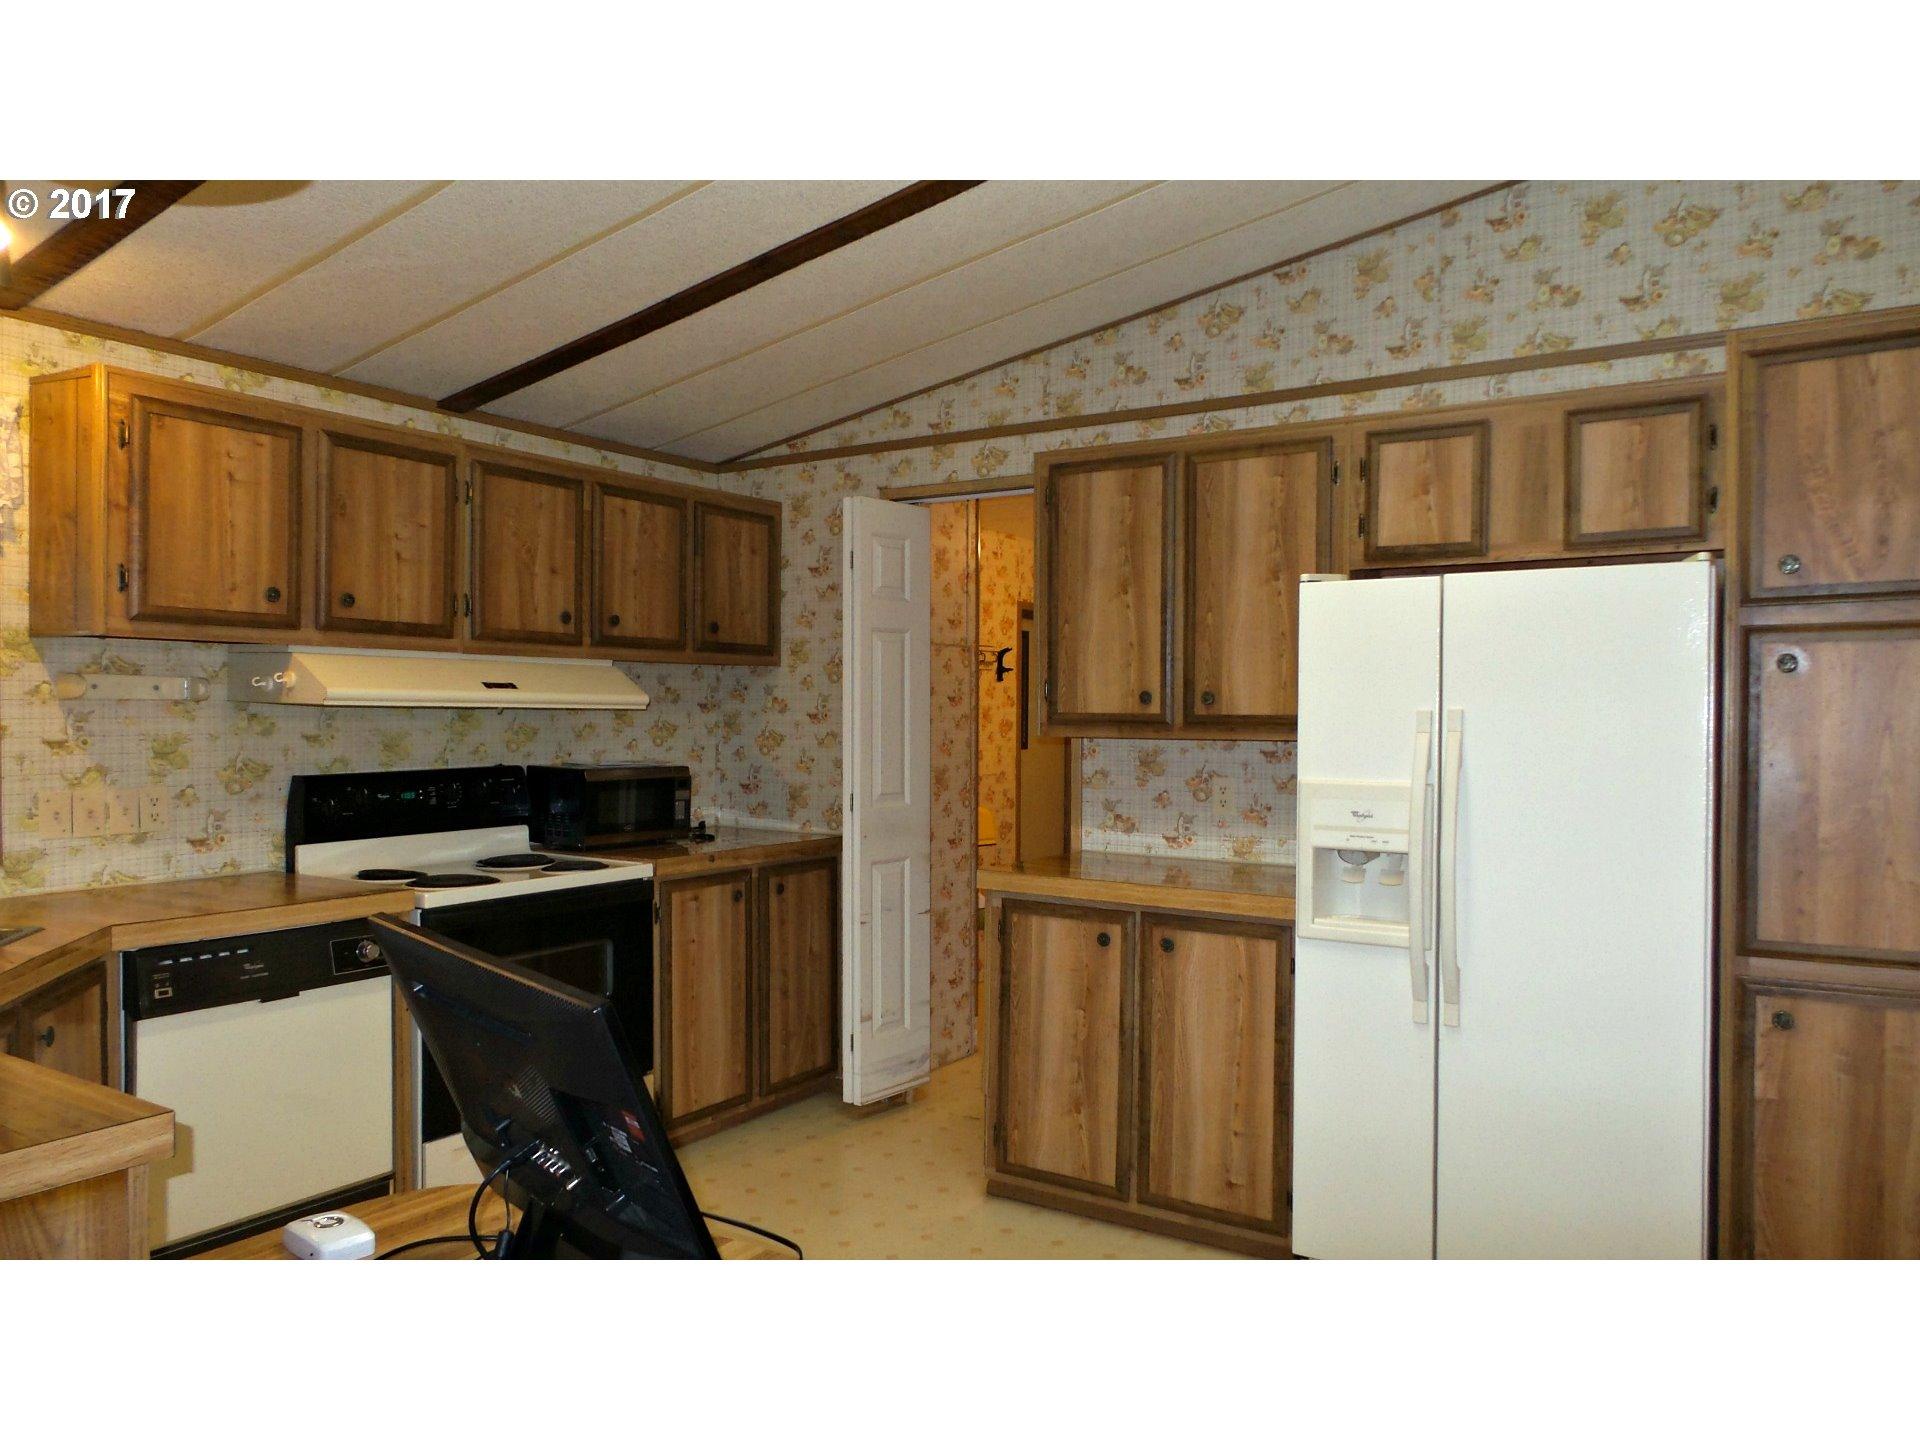 1013 SHADOW RANCH LN Roseburg, OR 97470 - MLS #: 17308324